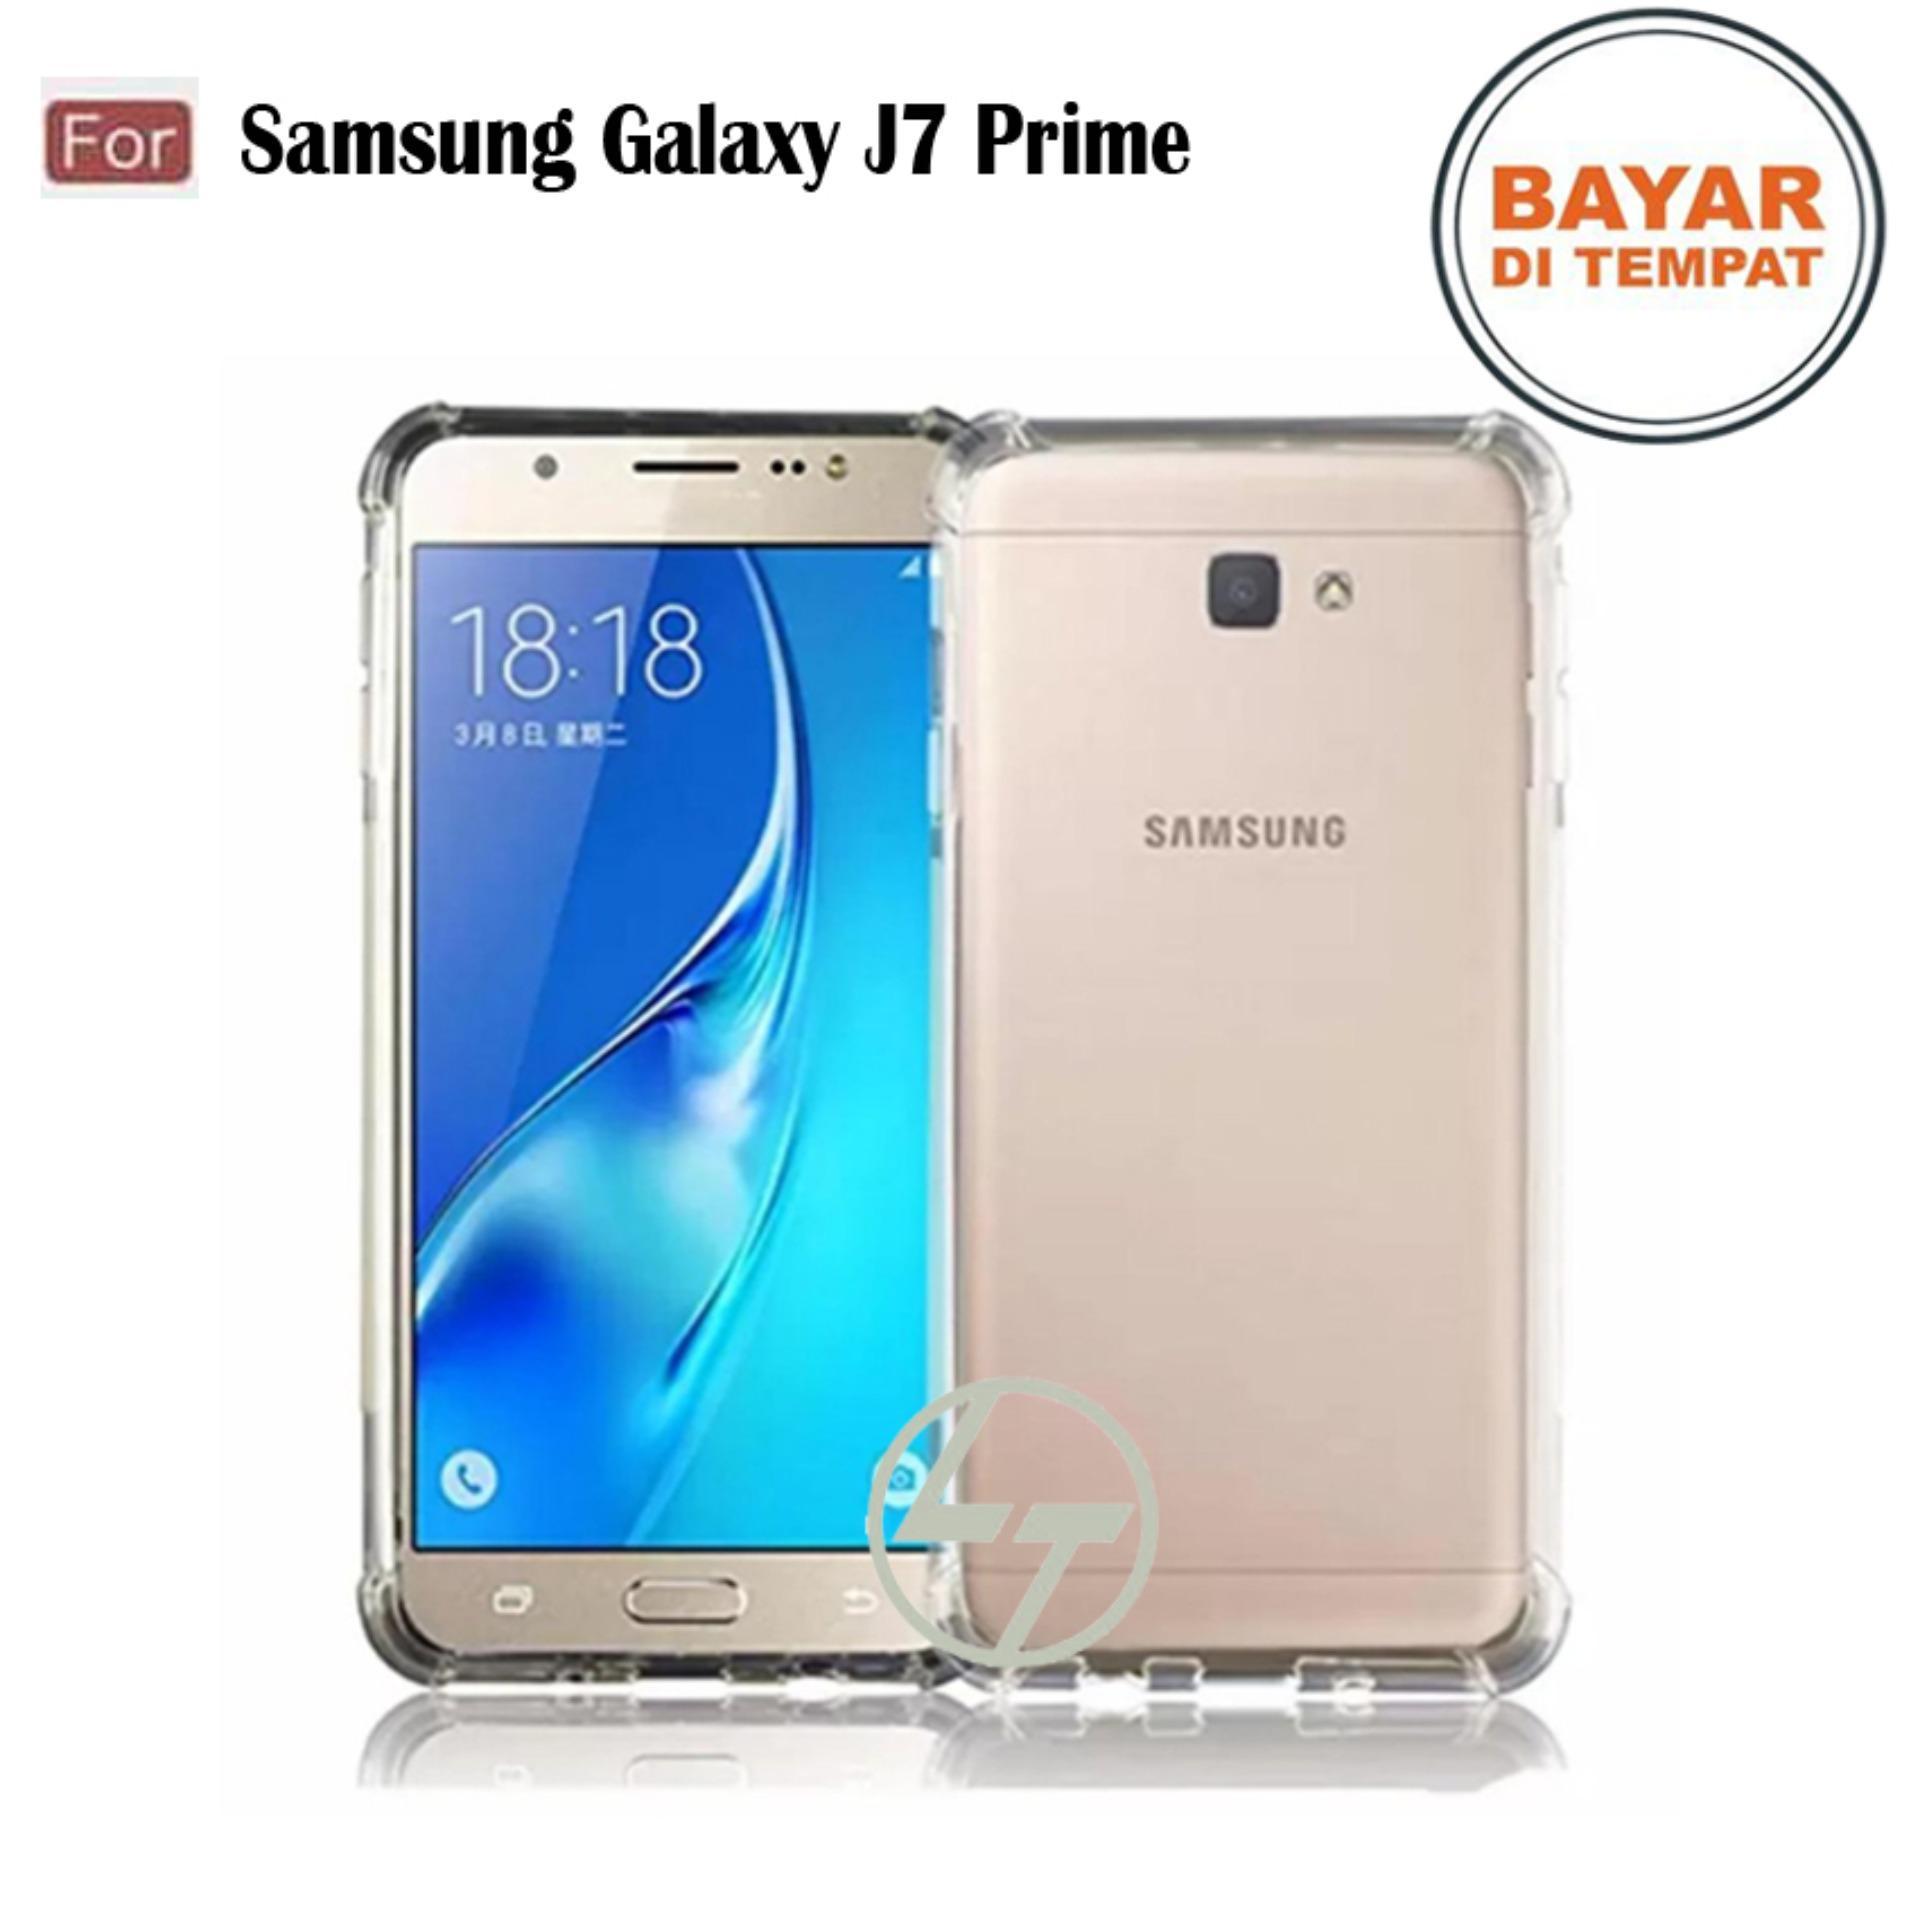 Lapak Case Anti Crack Elegant Softcase Casing Handphone Samsung ( Galaxy J7 Prime / 2016 )